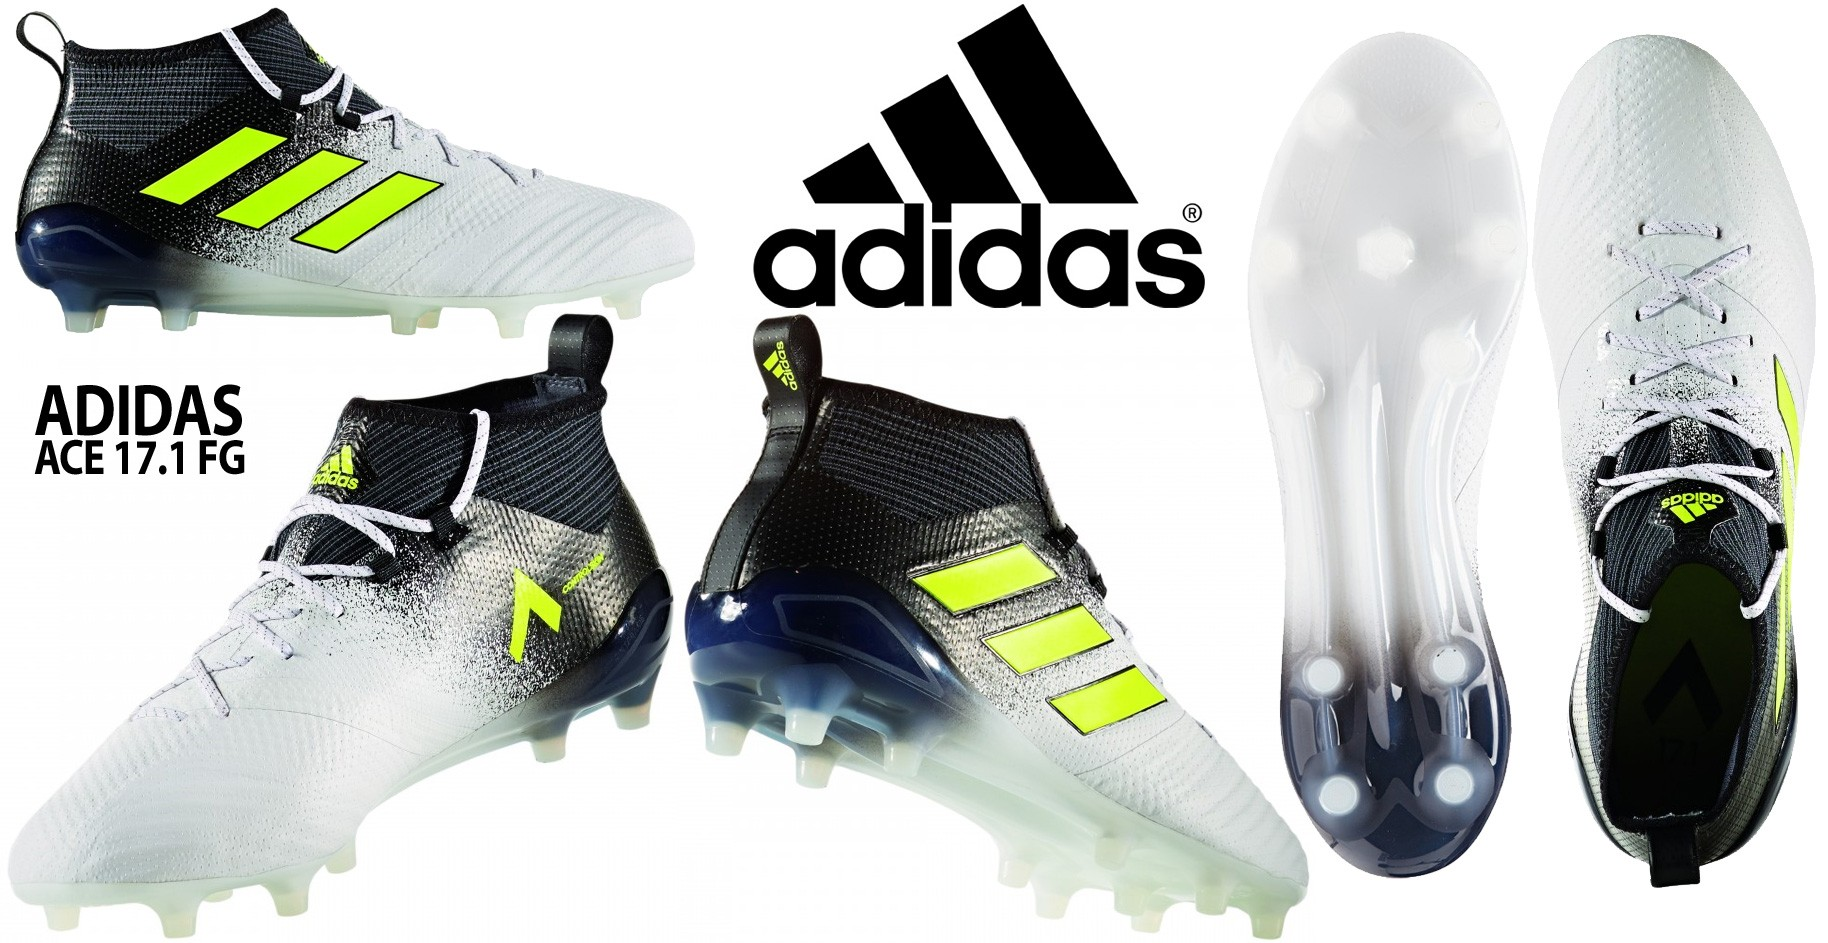 Adidas ACE 17 Football Shoes